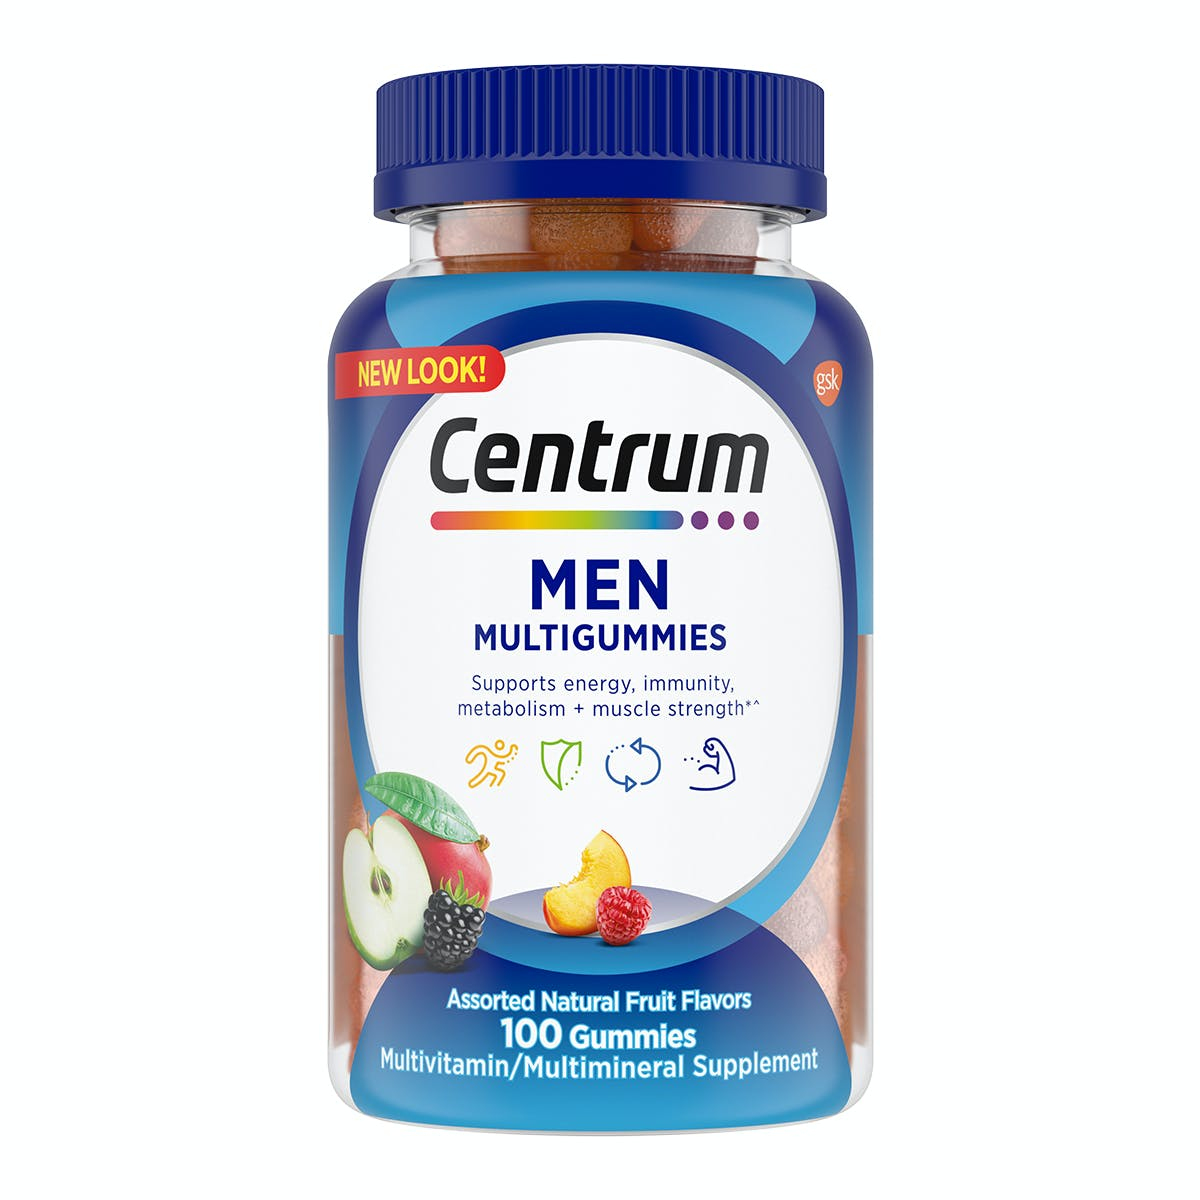 Bottle of centrum MultiGummies for men vitamins